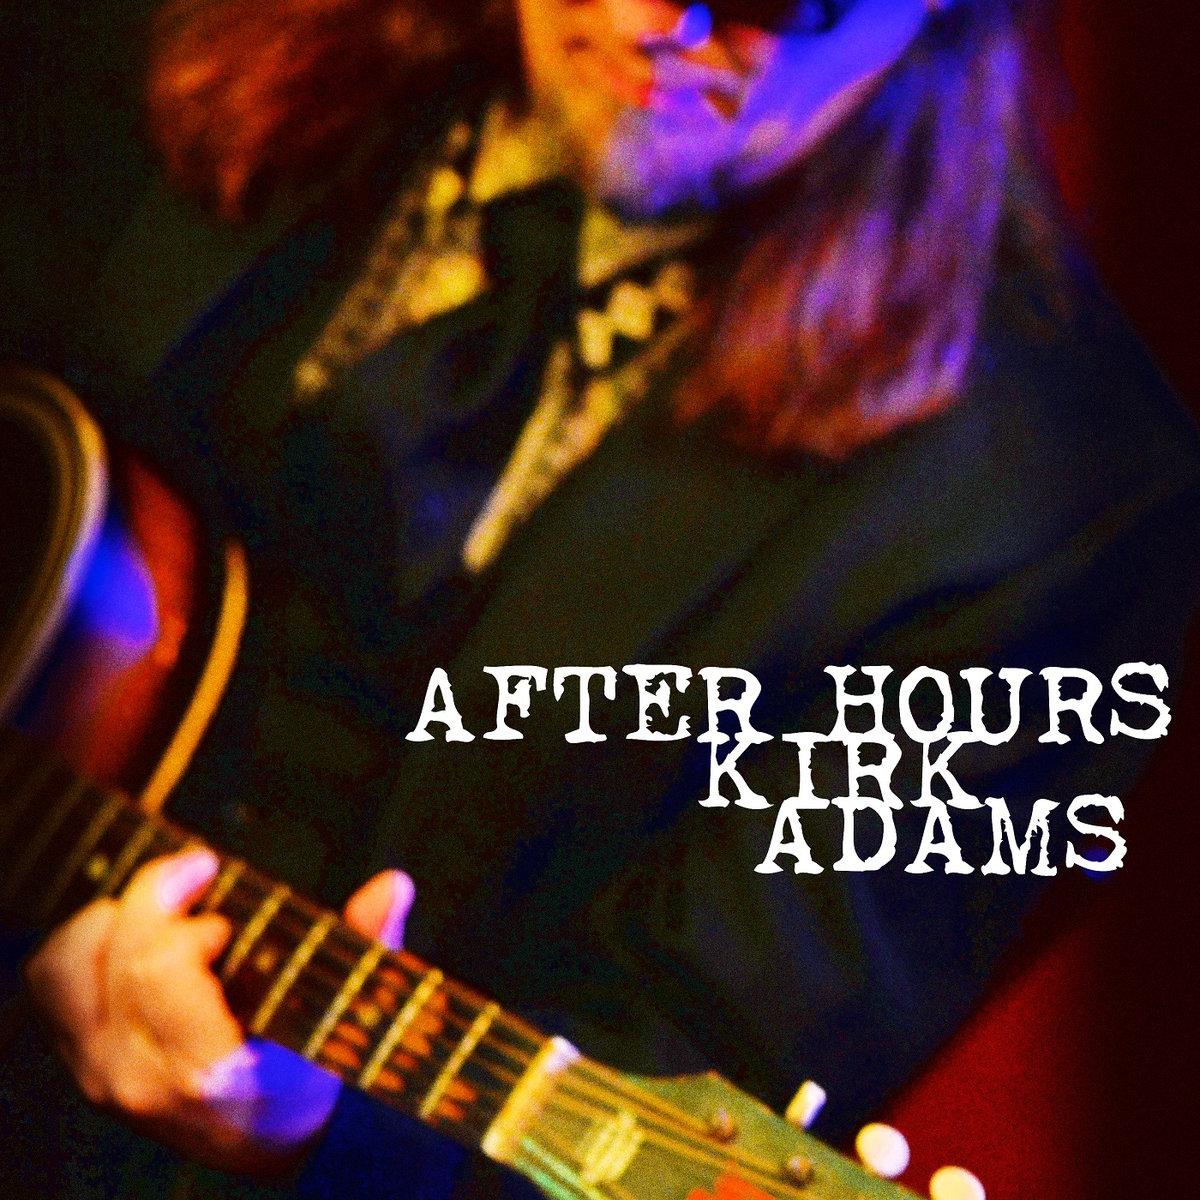 kirk adams after hours